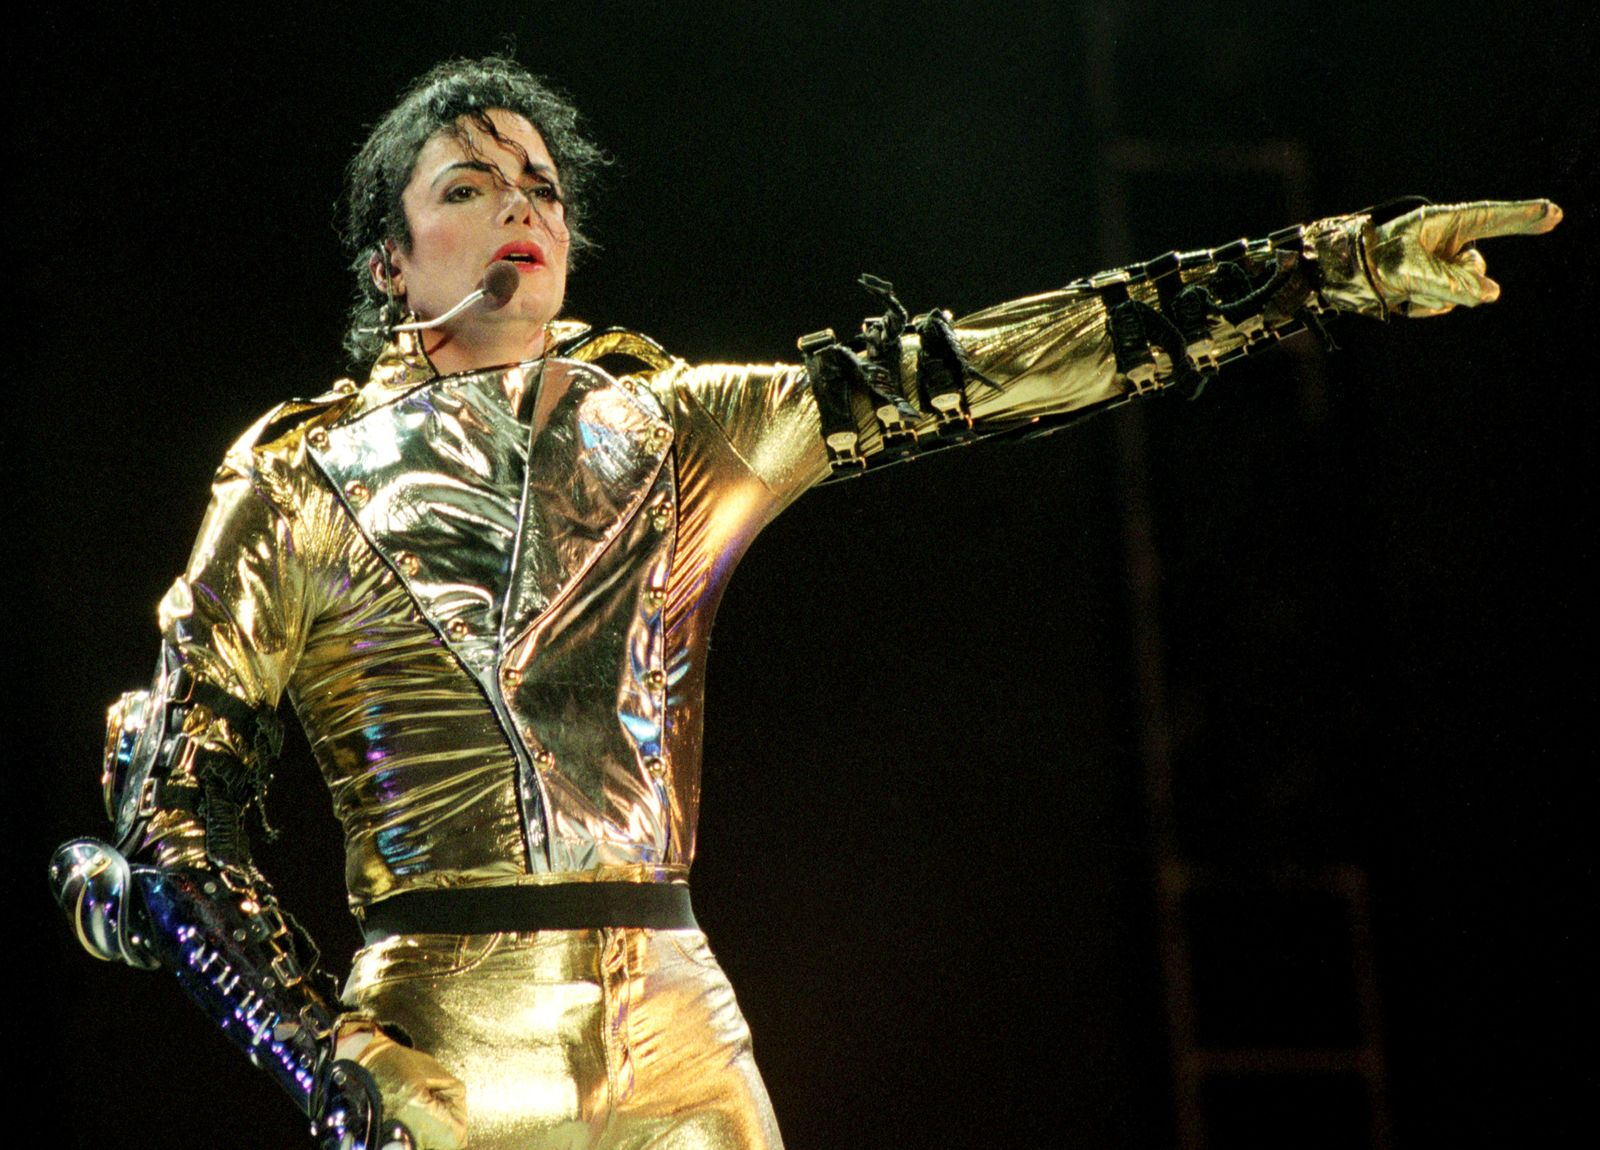 Michael Jackson / Bühne